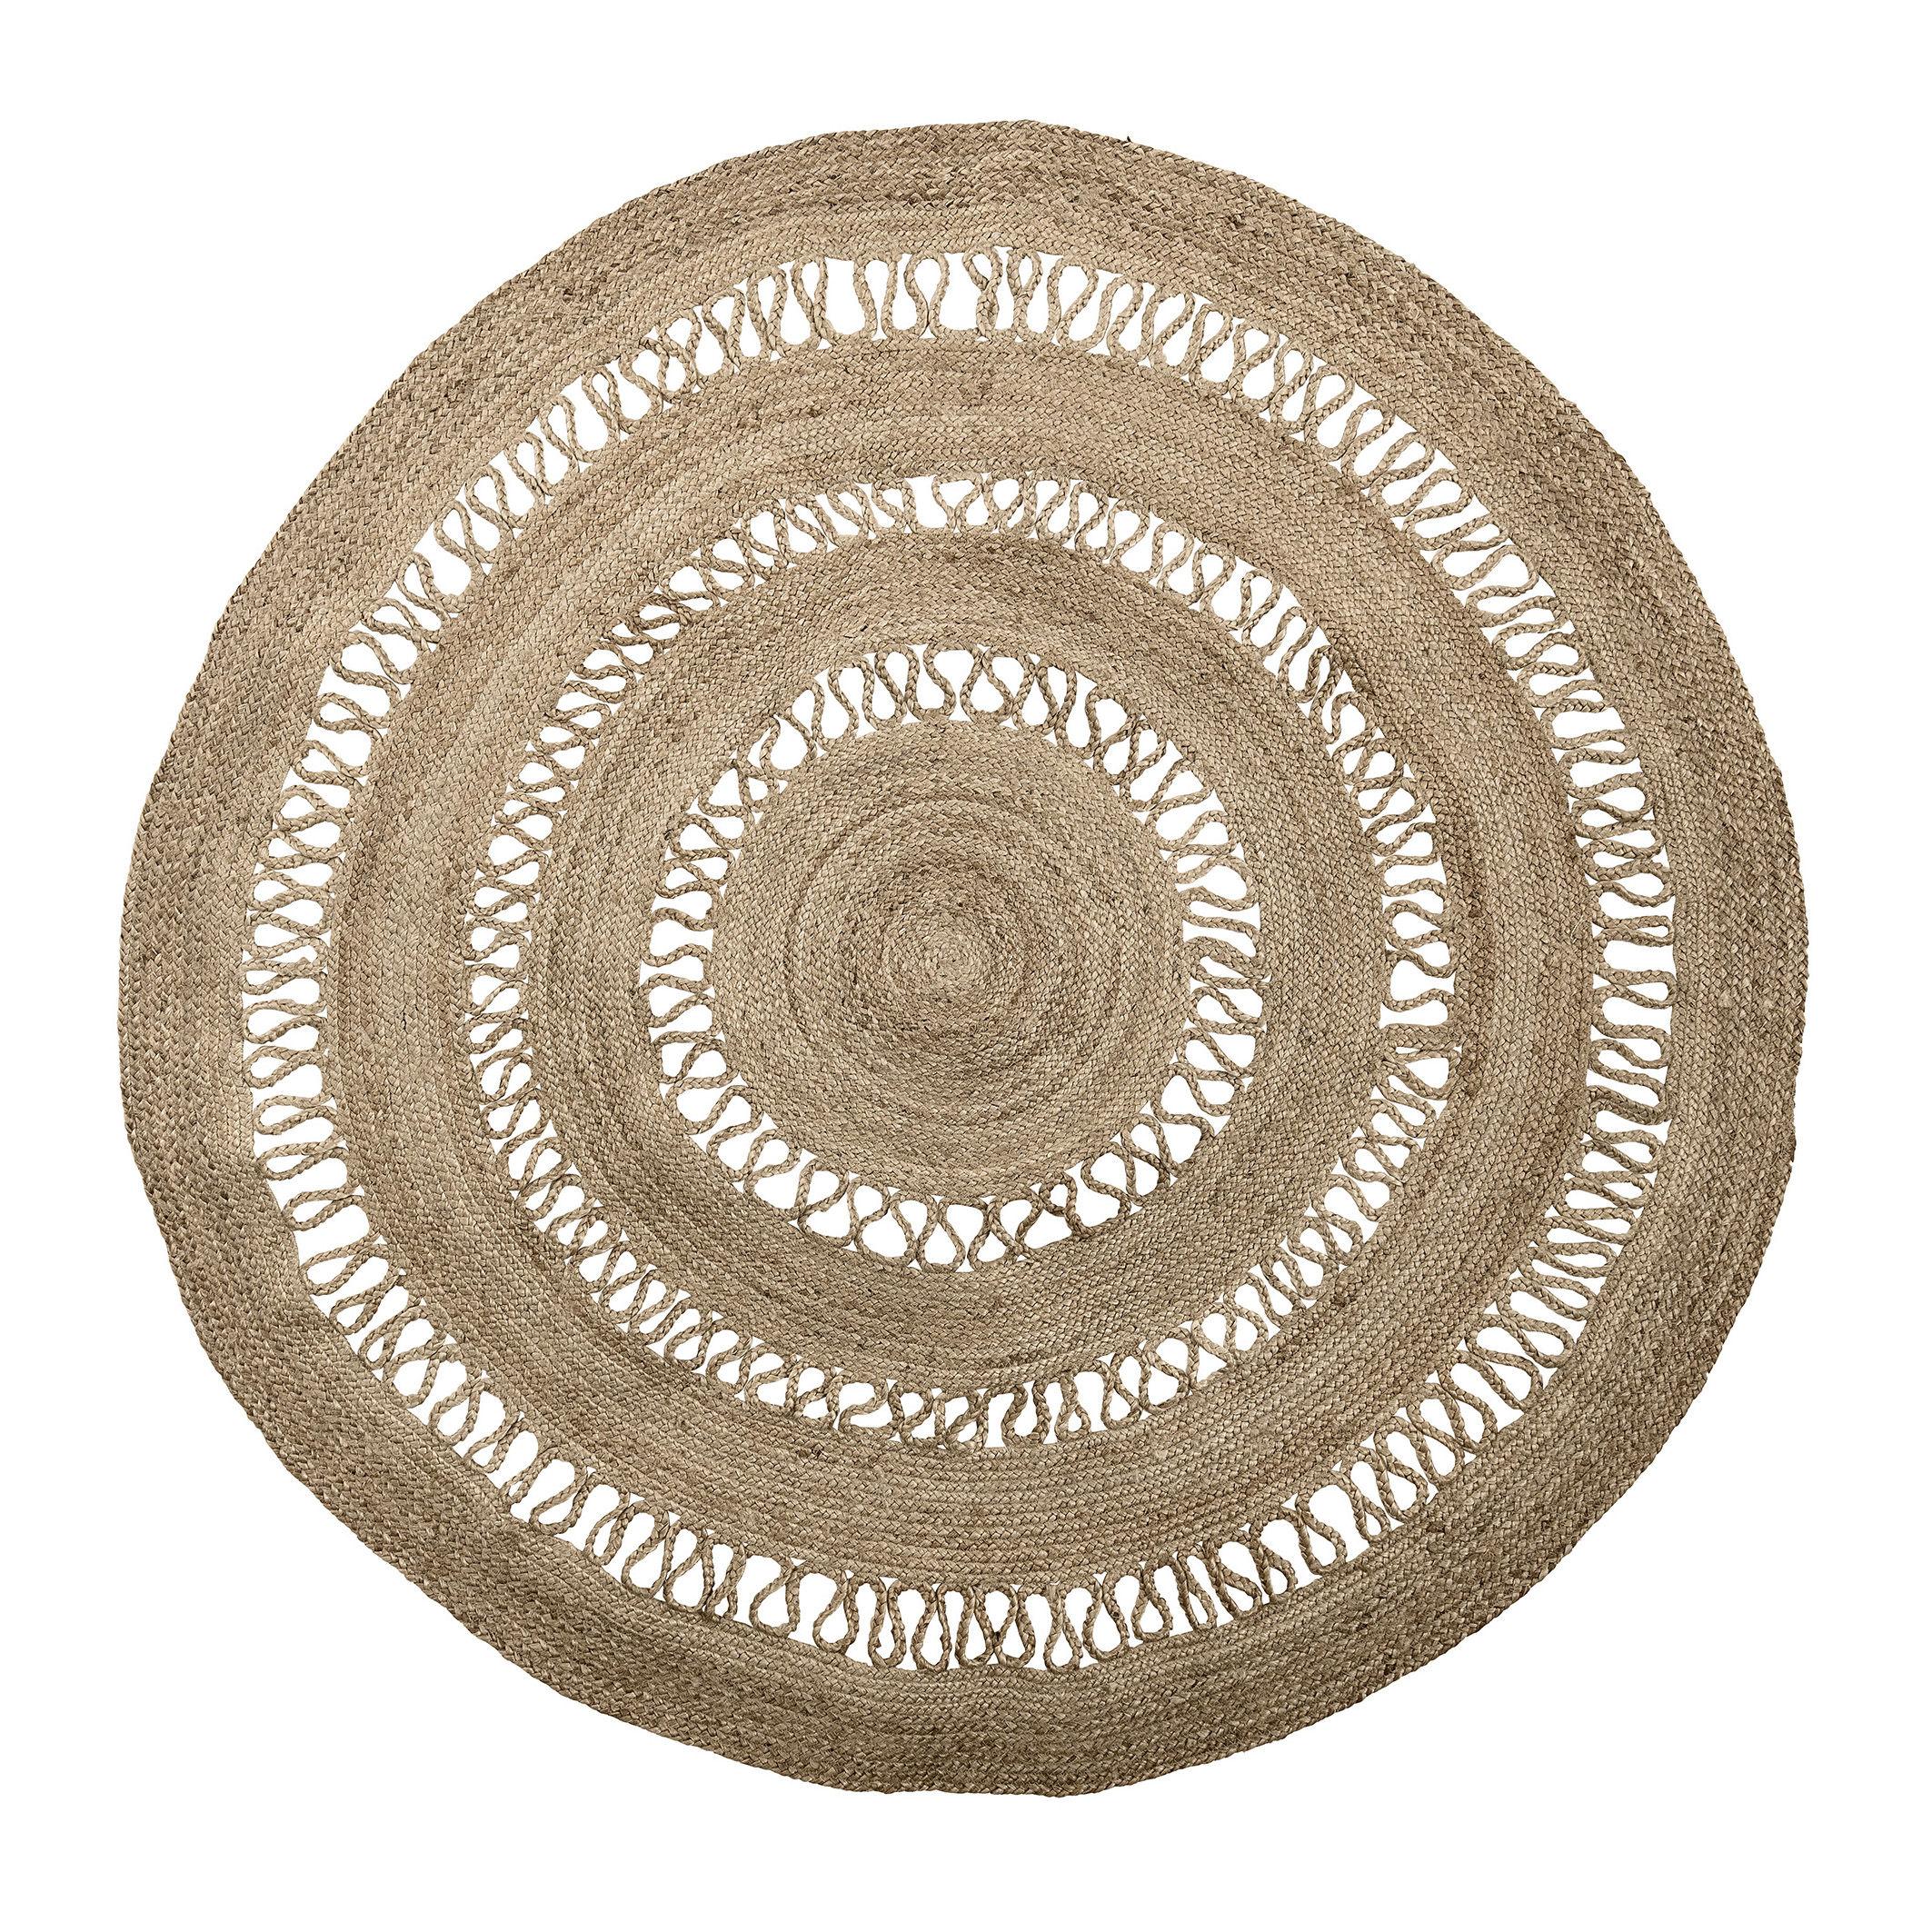 Dekoration - Teppiche - Außenteppich / Jute - Ø 180 cm - Bloomingville - Jute Natur - Jute, natur